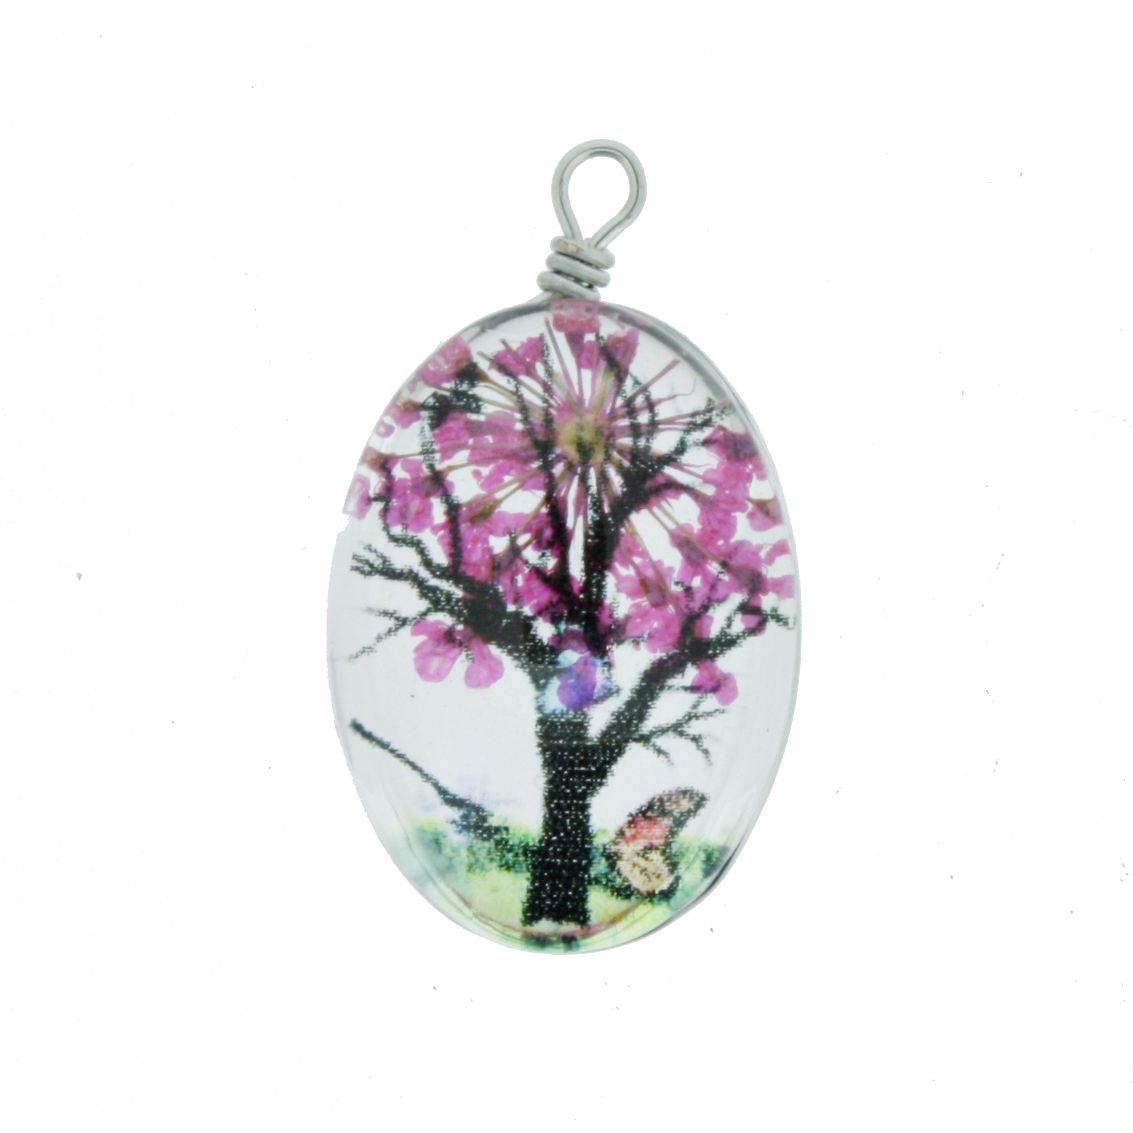 Árvore da Vida - Gema - Pink - 28mm  - Stéphanie Bijoux® - Peças para Bijuterias e Artesanato